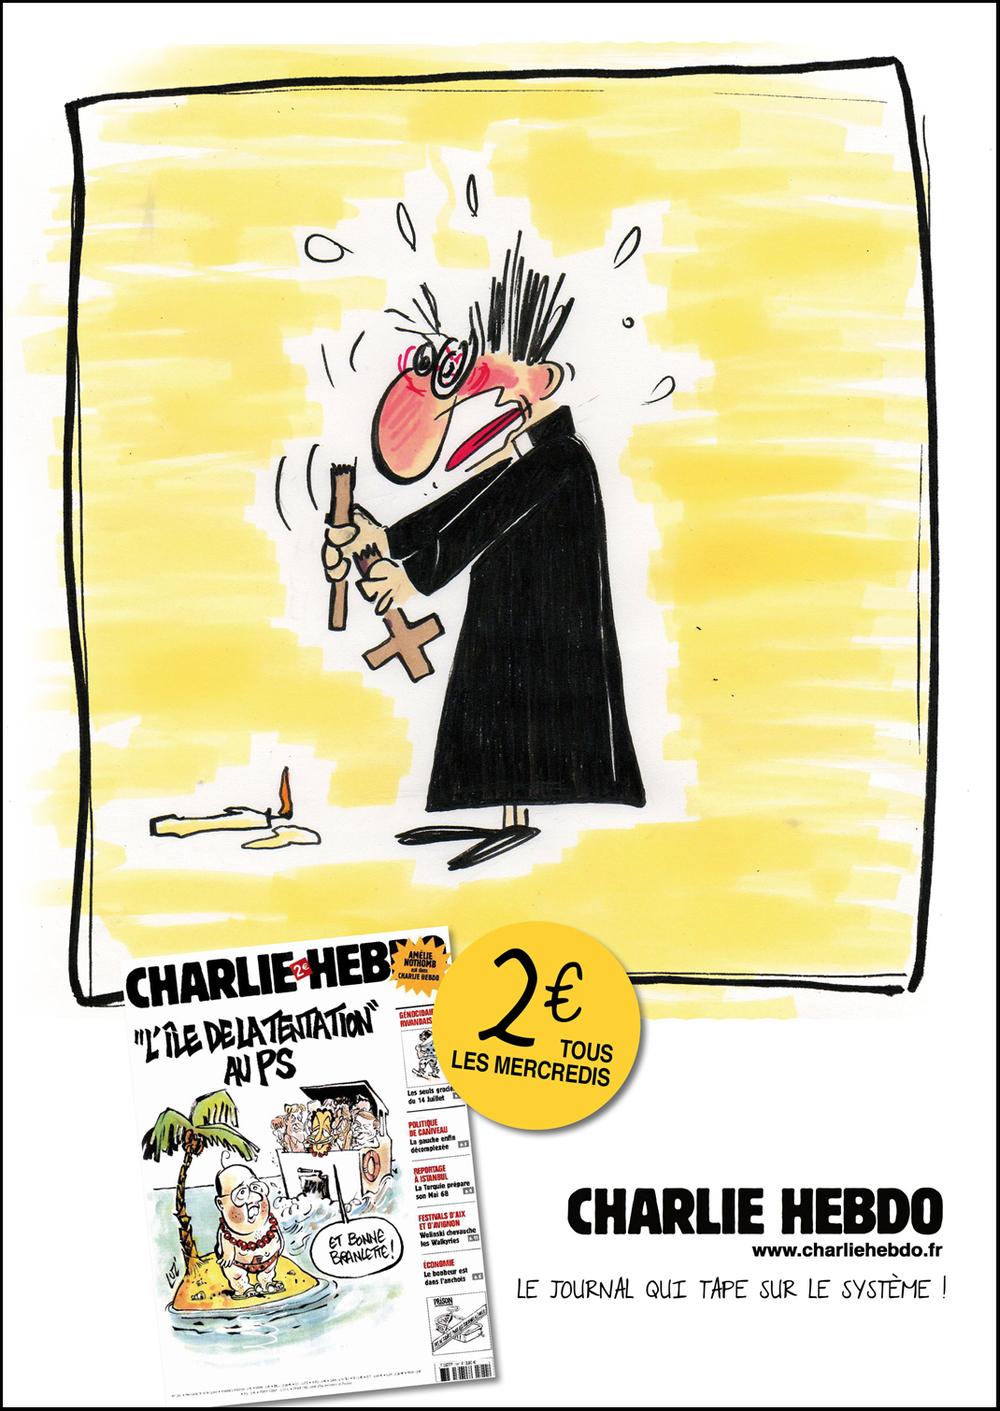 charlie-hebdo-cure-da-lily-la-fronde-redac-simon-erault.jpg